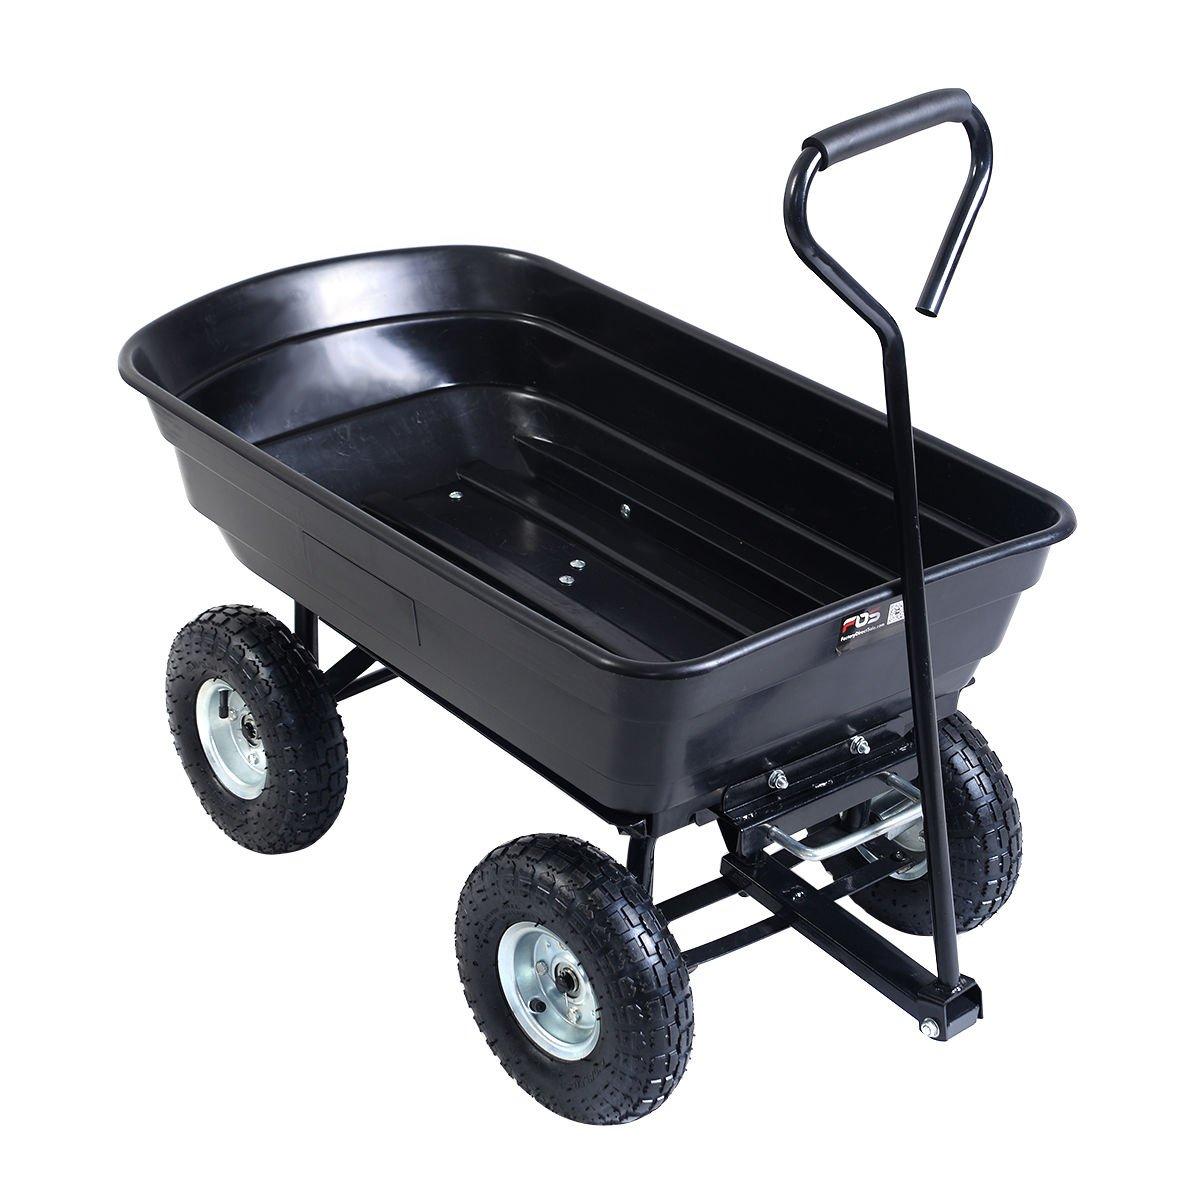 Heavy Duty Garden Dump Yard Utility Cart Wagon Dumper Lawn Wheel Barrow Trailer New